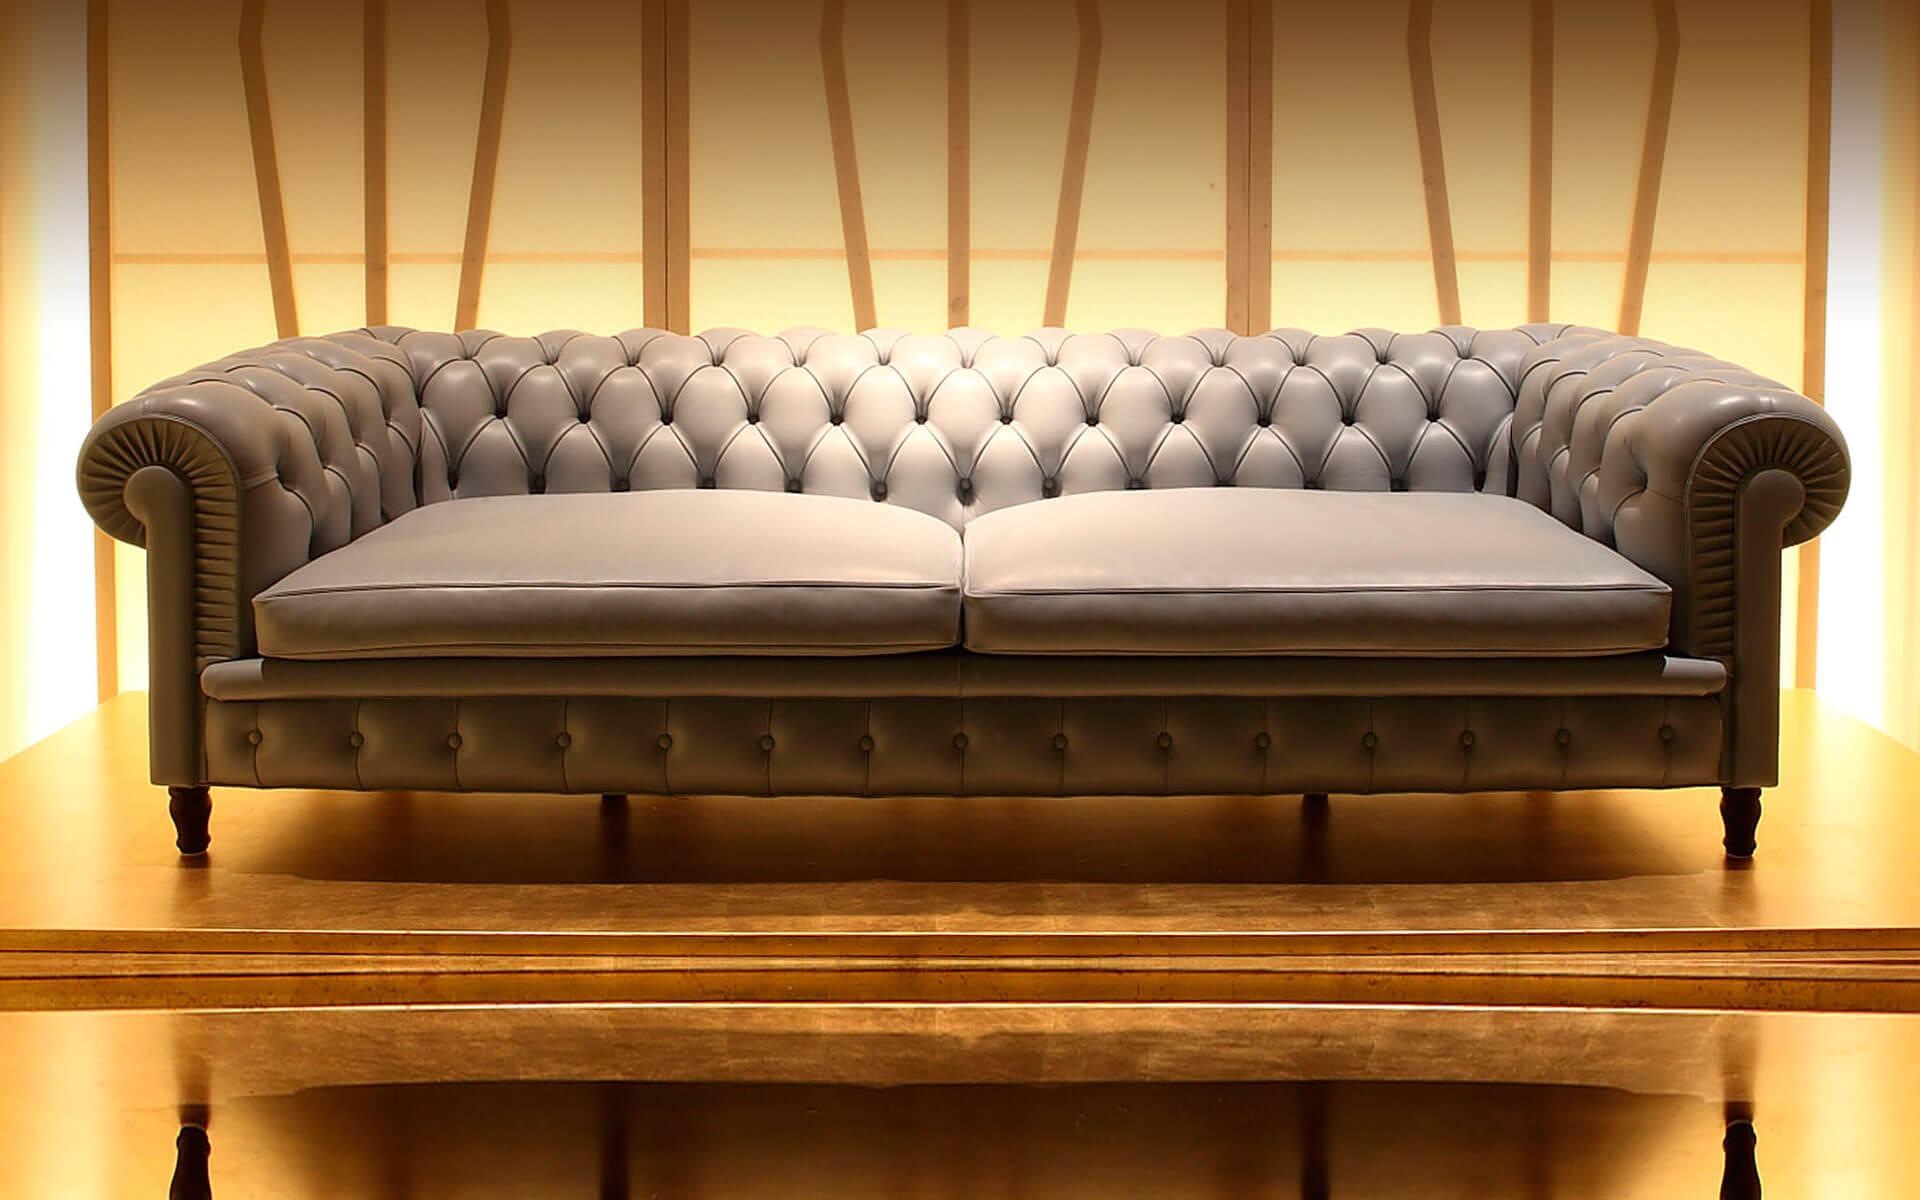 Tienda de muebles de dise o italiano - Sillones de diseno italiano ...